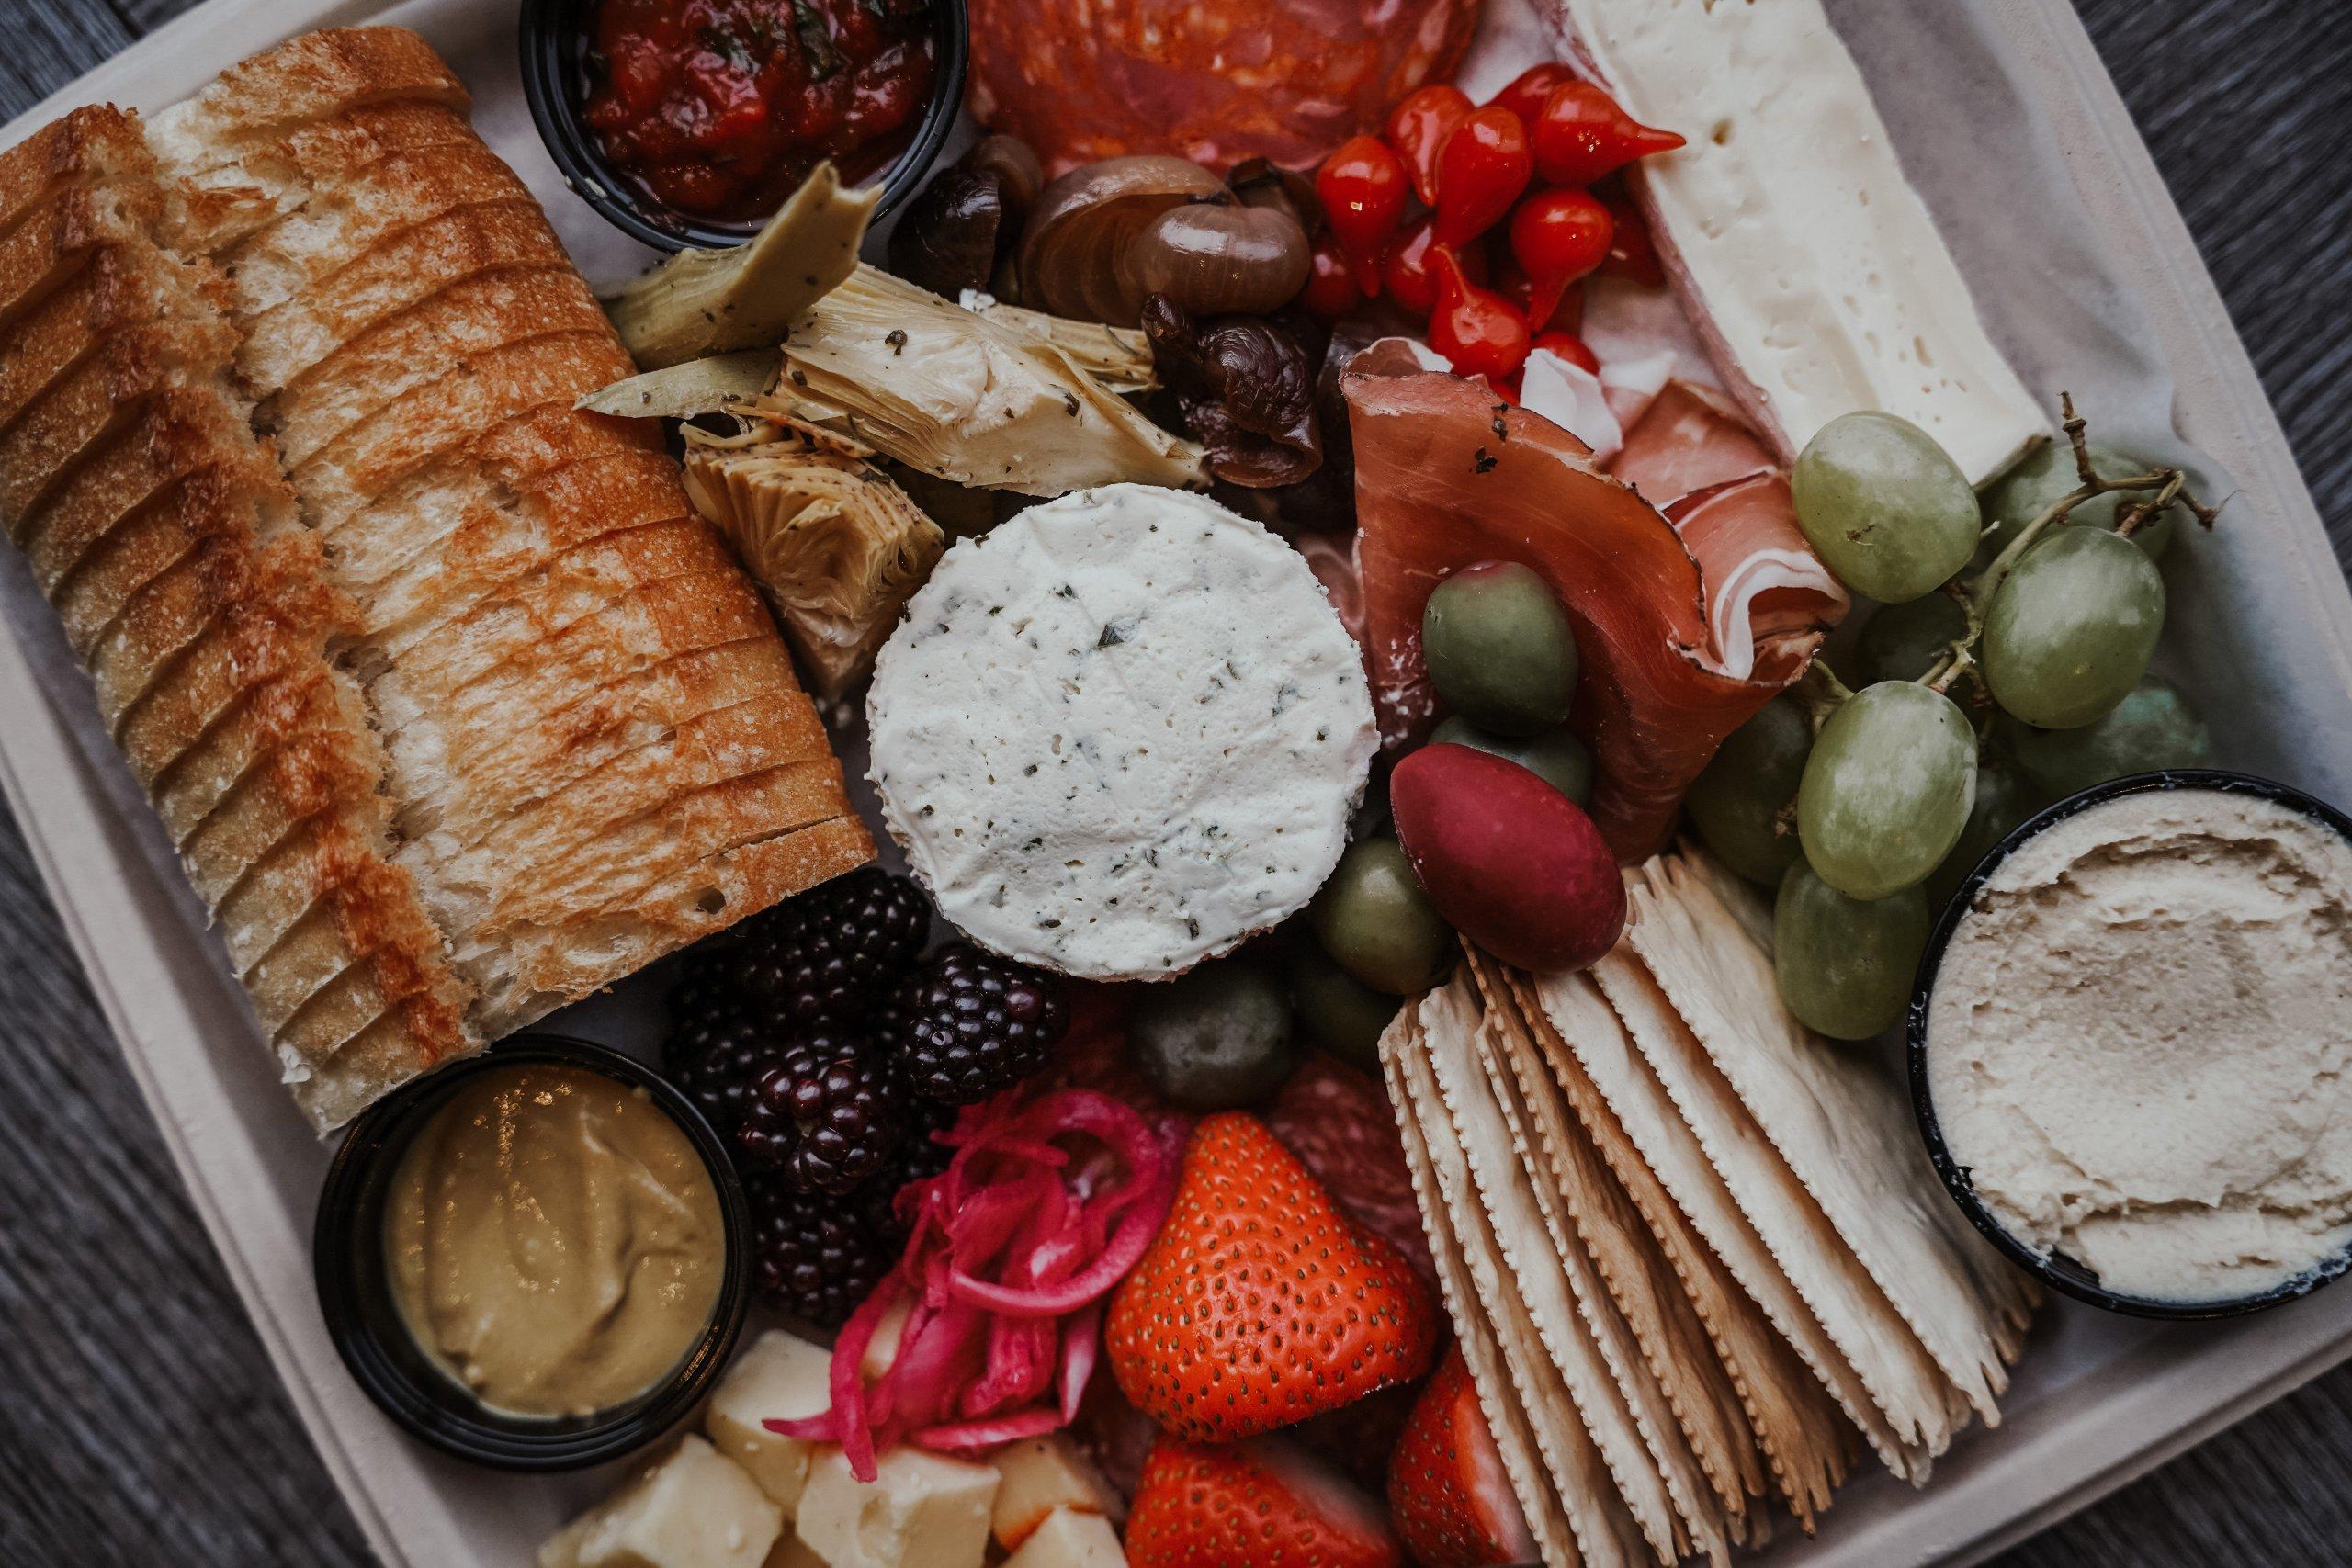 Artisanal Charcuterie & Cheese